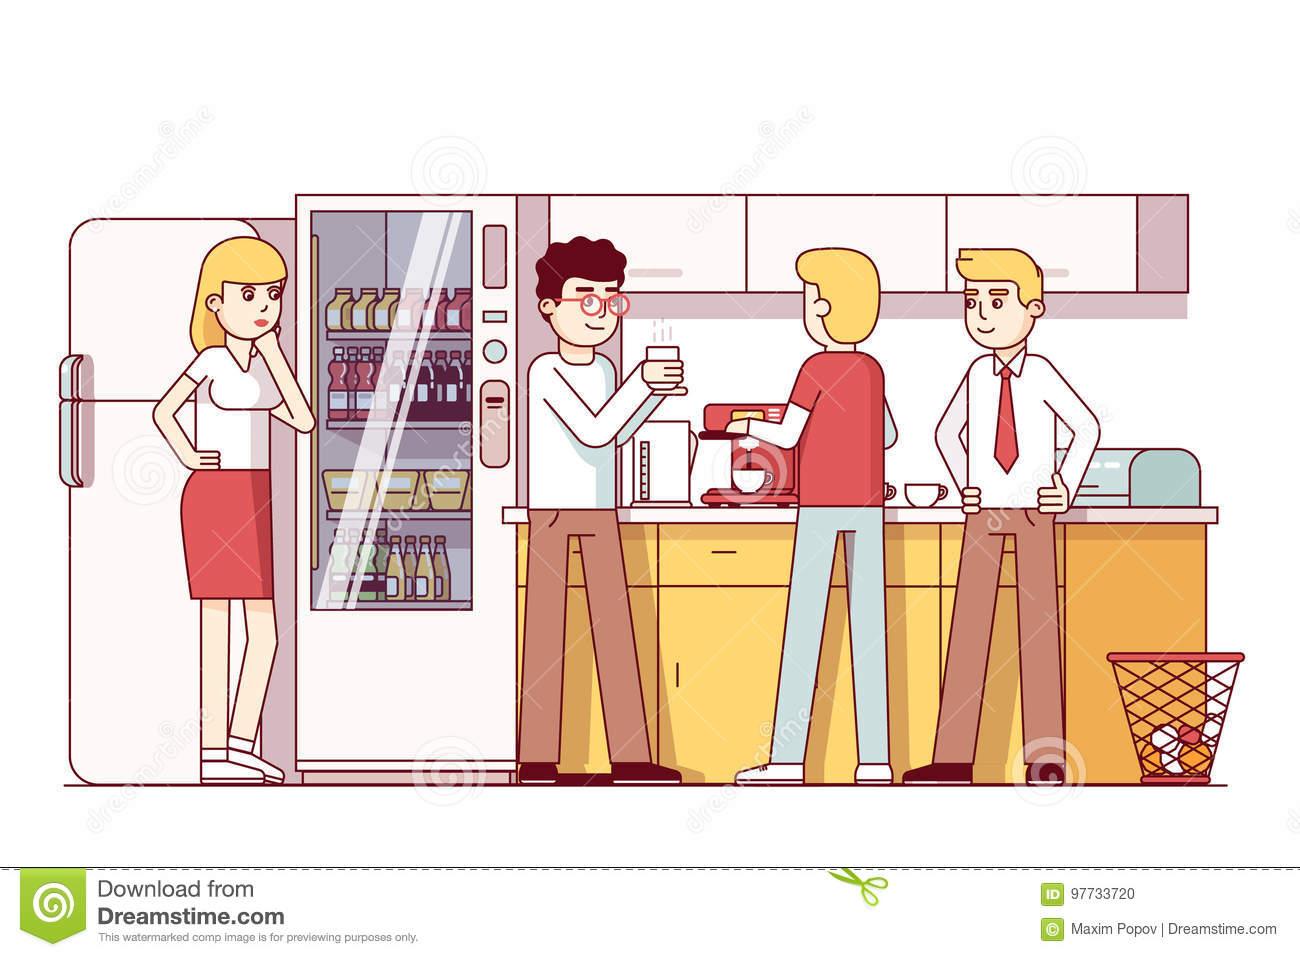 Full Size of Büro Küche Dreckig Büro Küche 150 Cm In Der Büroküche Gibts Kuchen Büroküche 120 Cm Küche Büroküche